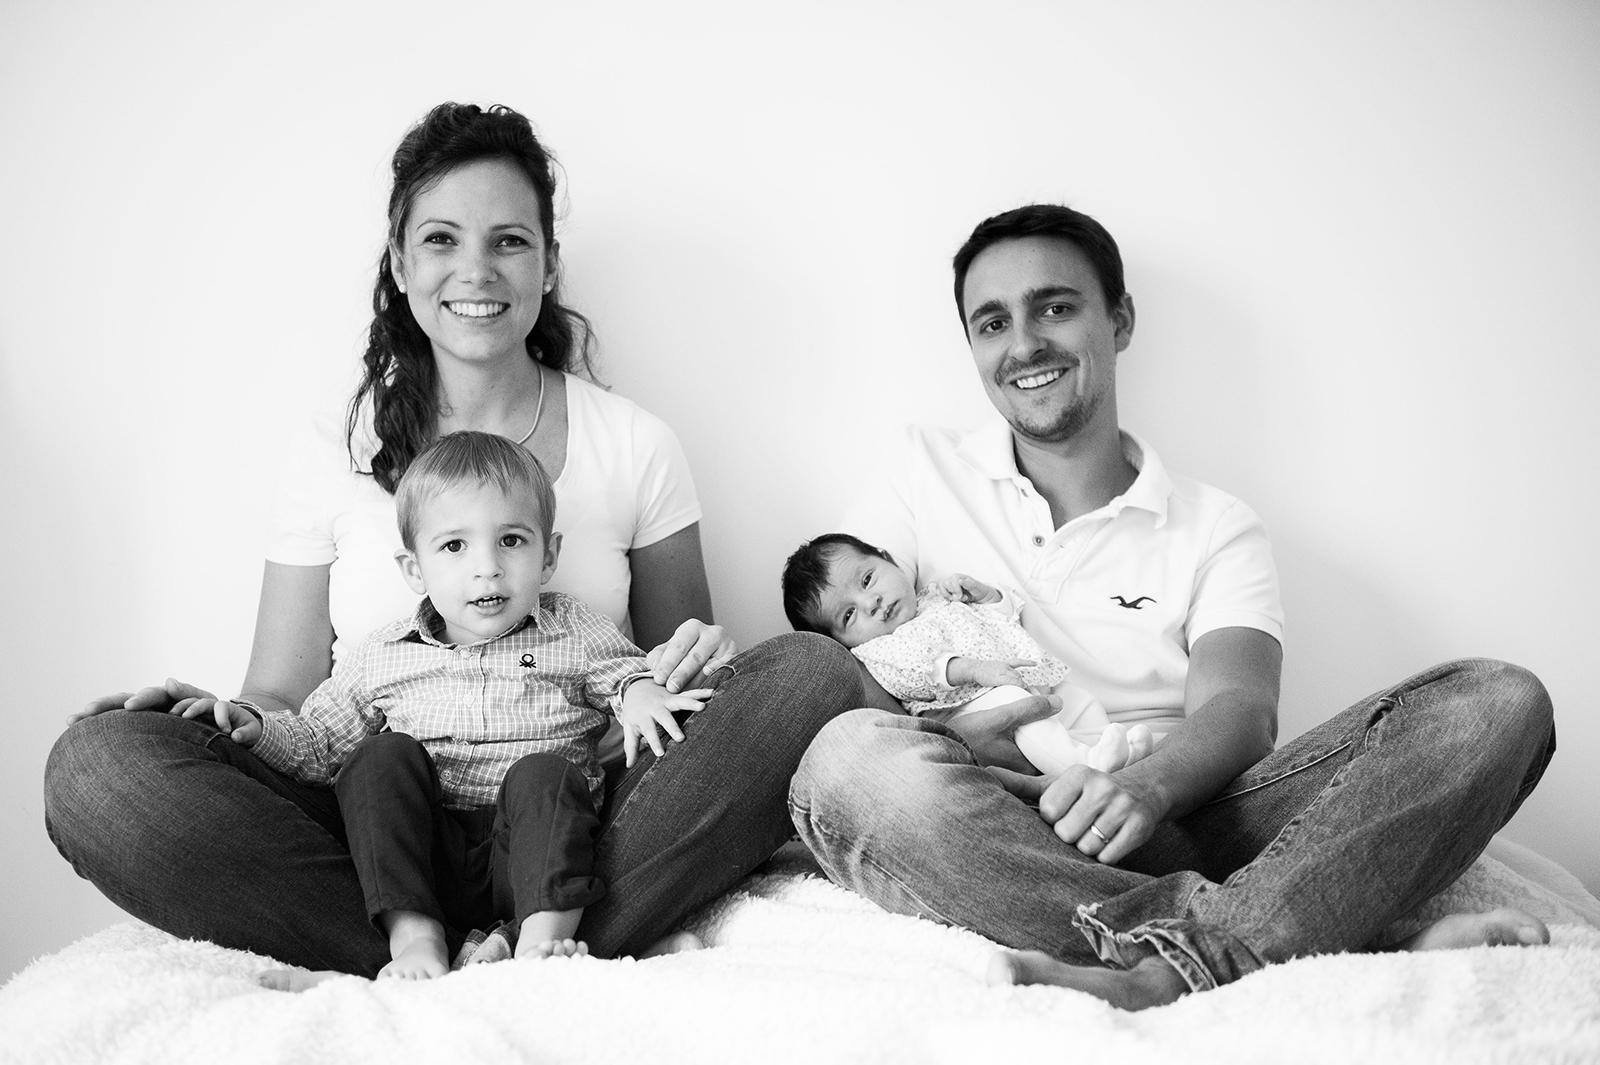 seance-photo-famille-photo-grossesse-photo-bébé-naissance-sabrina-godemert-photographe-seine-et-marne028